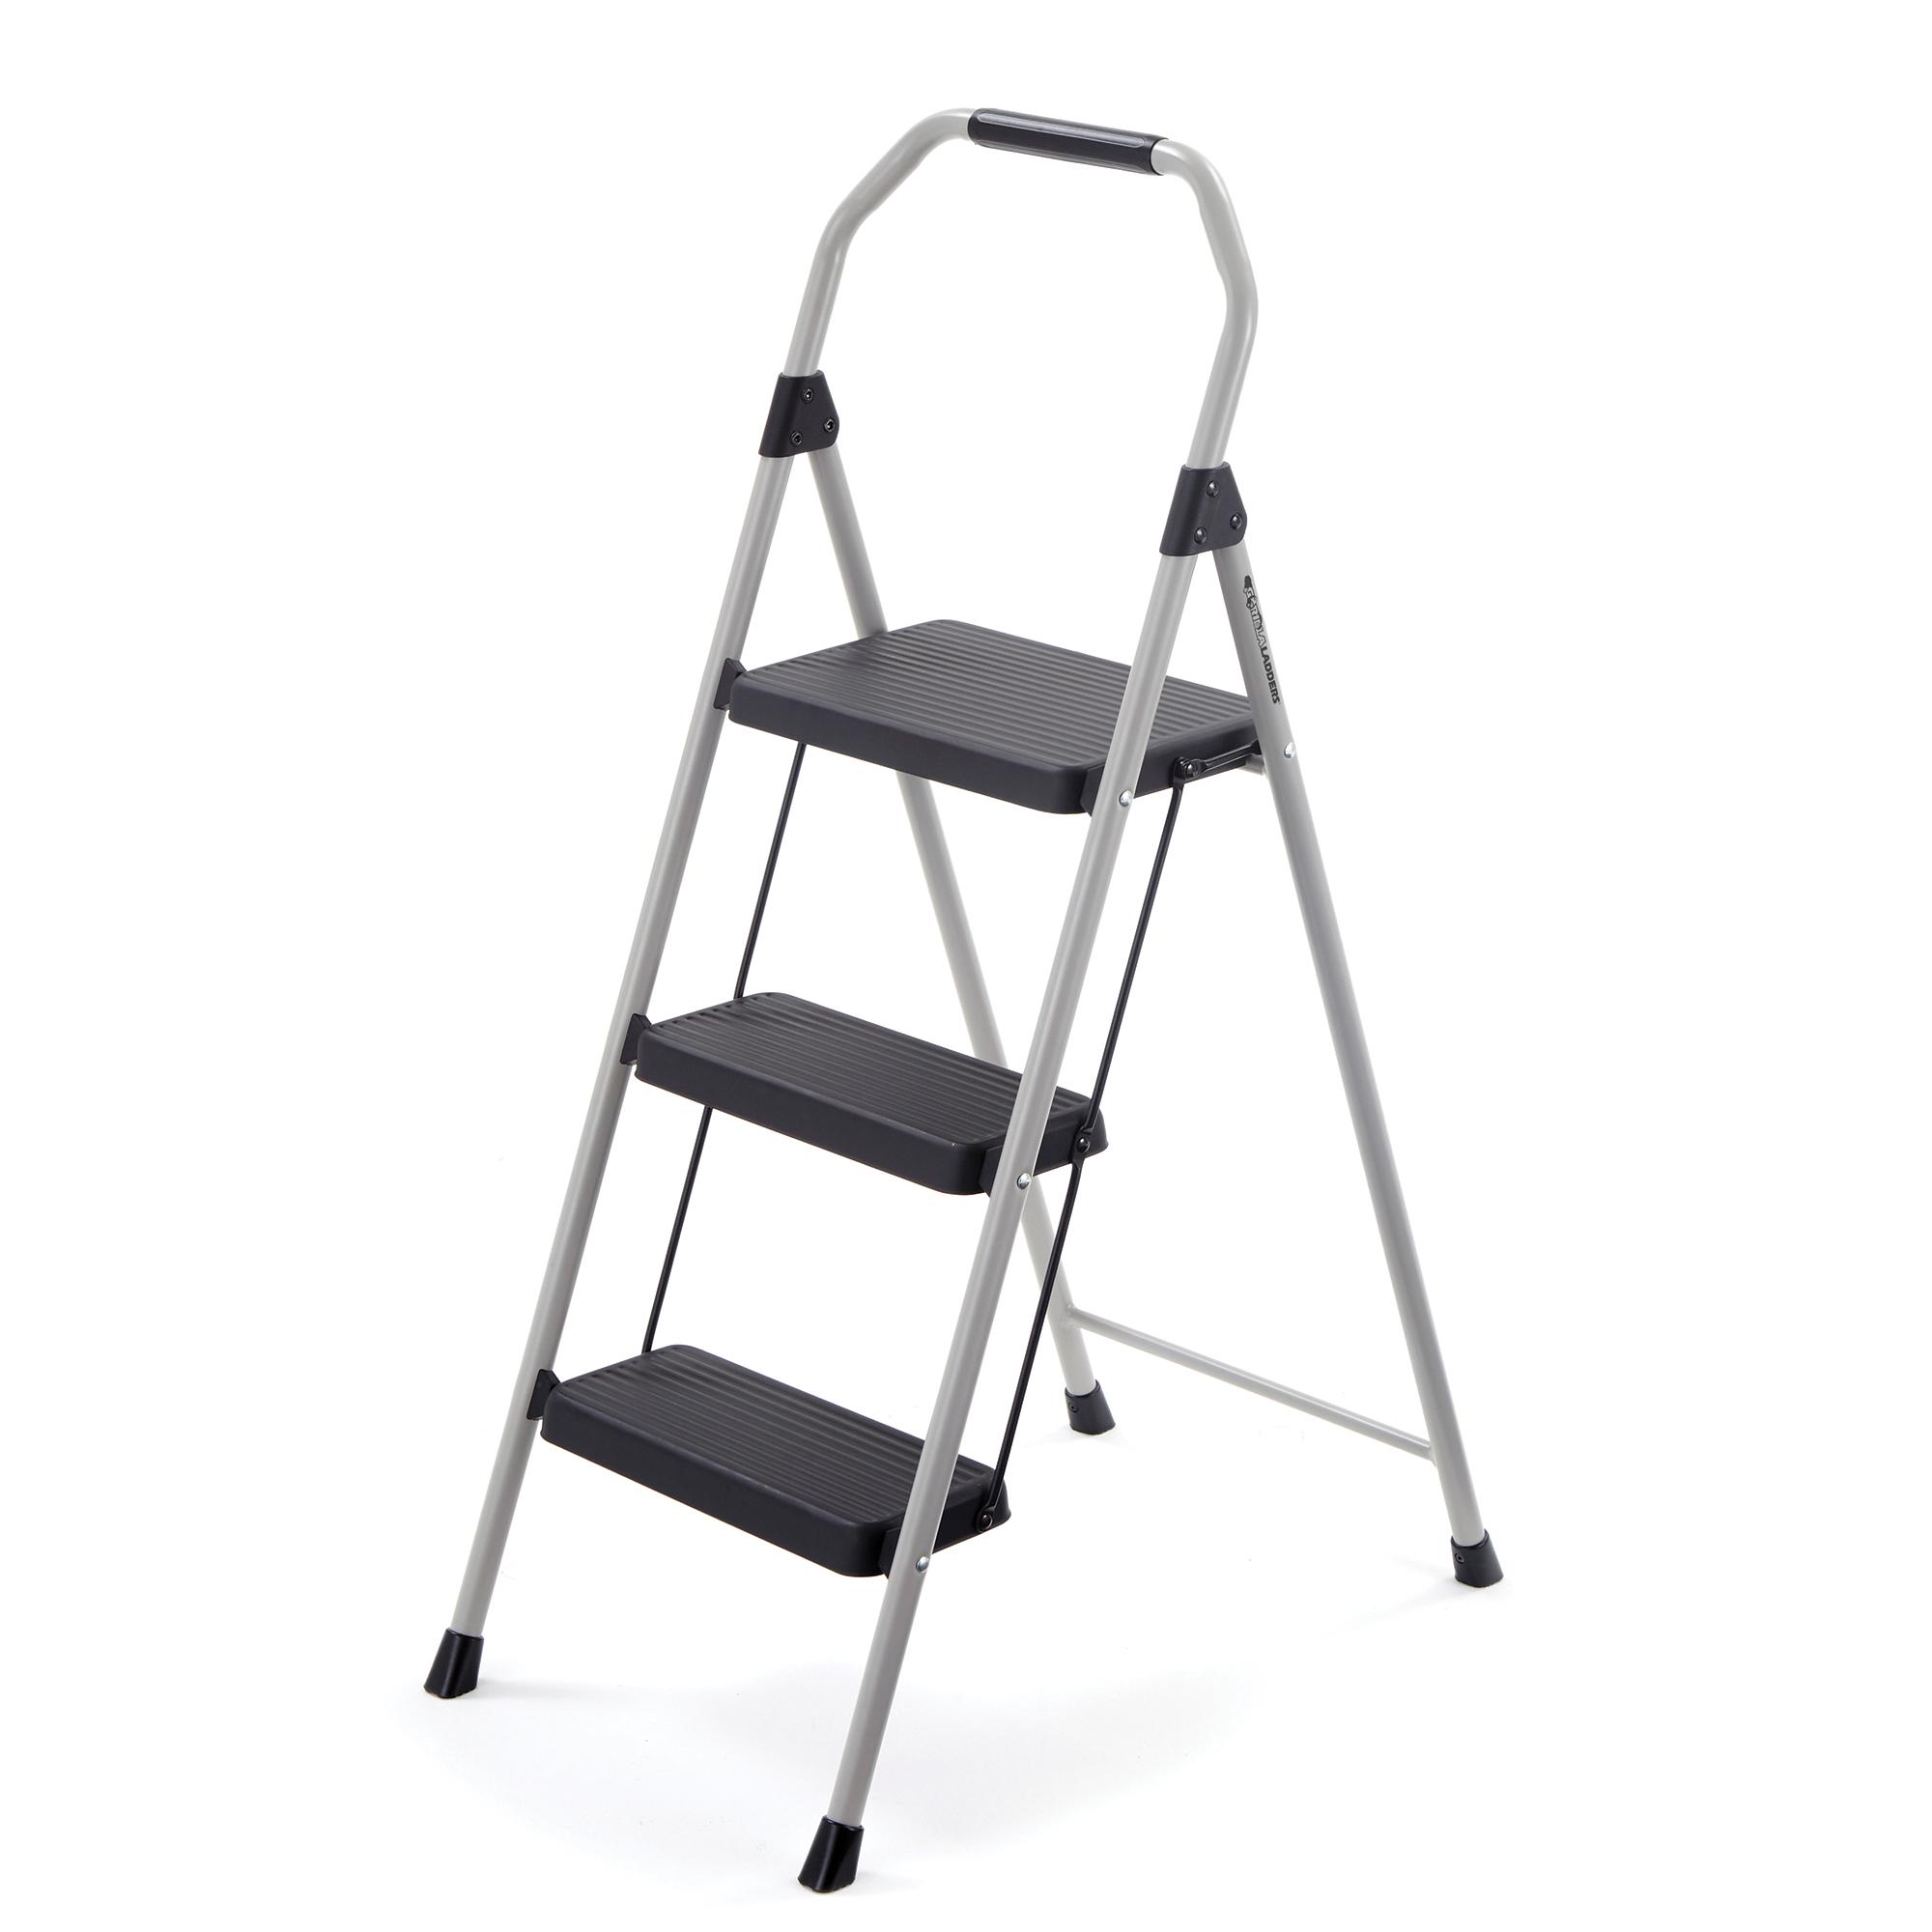 Gorilla Laddersgls 3cs Gorilla Ladders